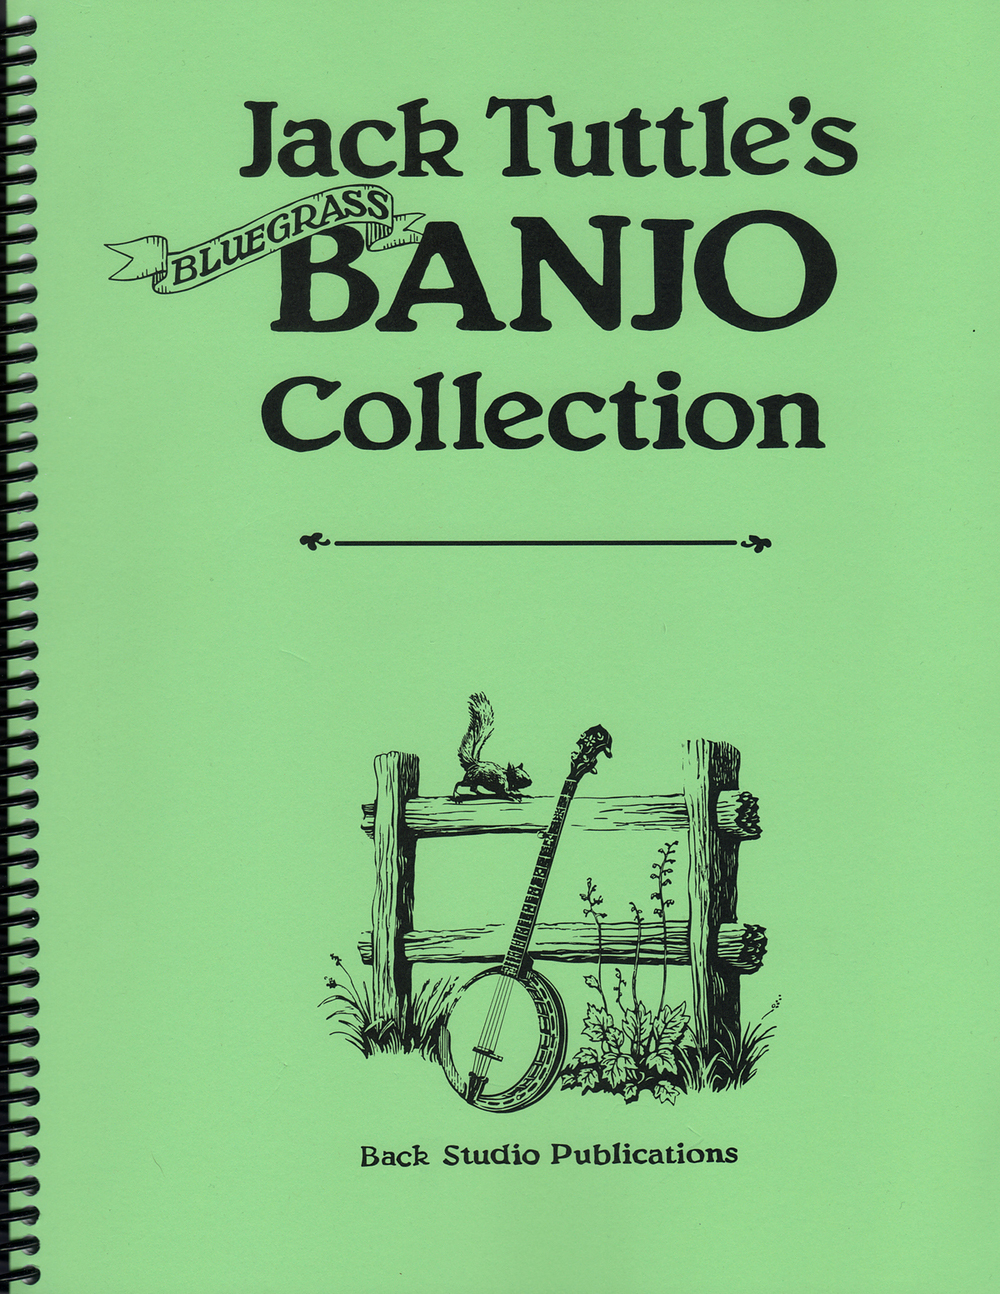 Jack Tuttle's Bluegrass Banjo Collection